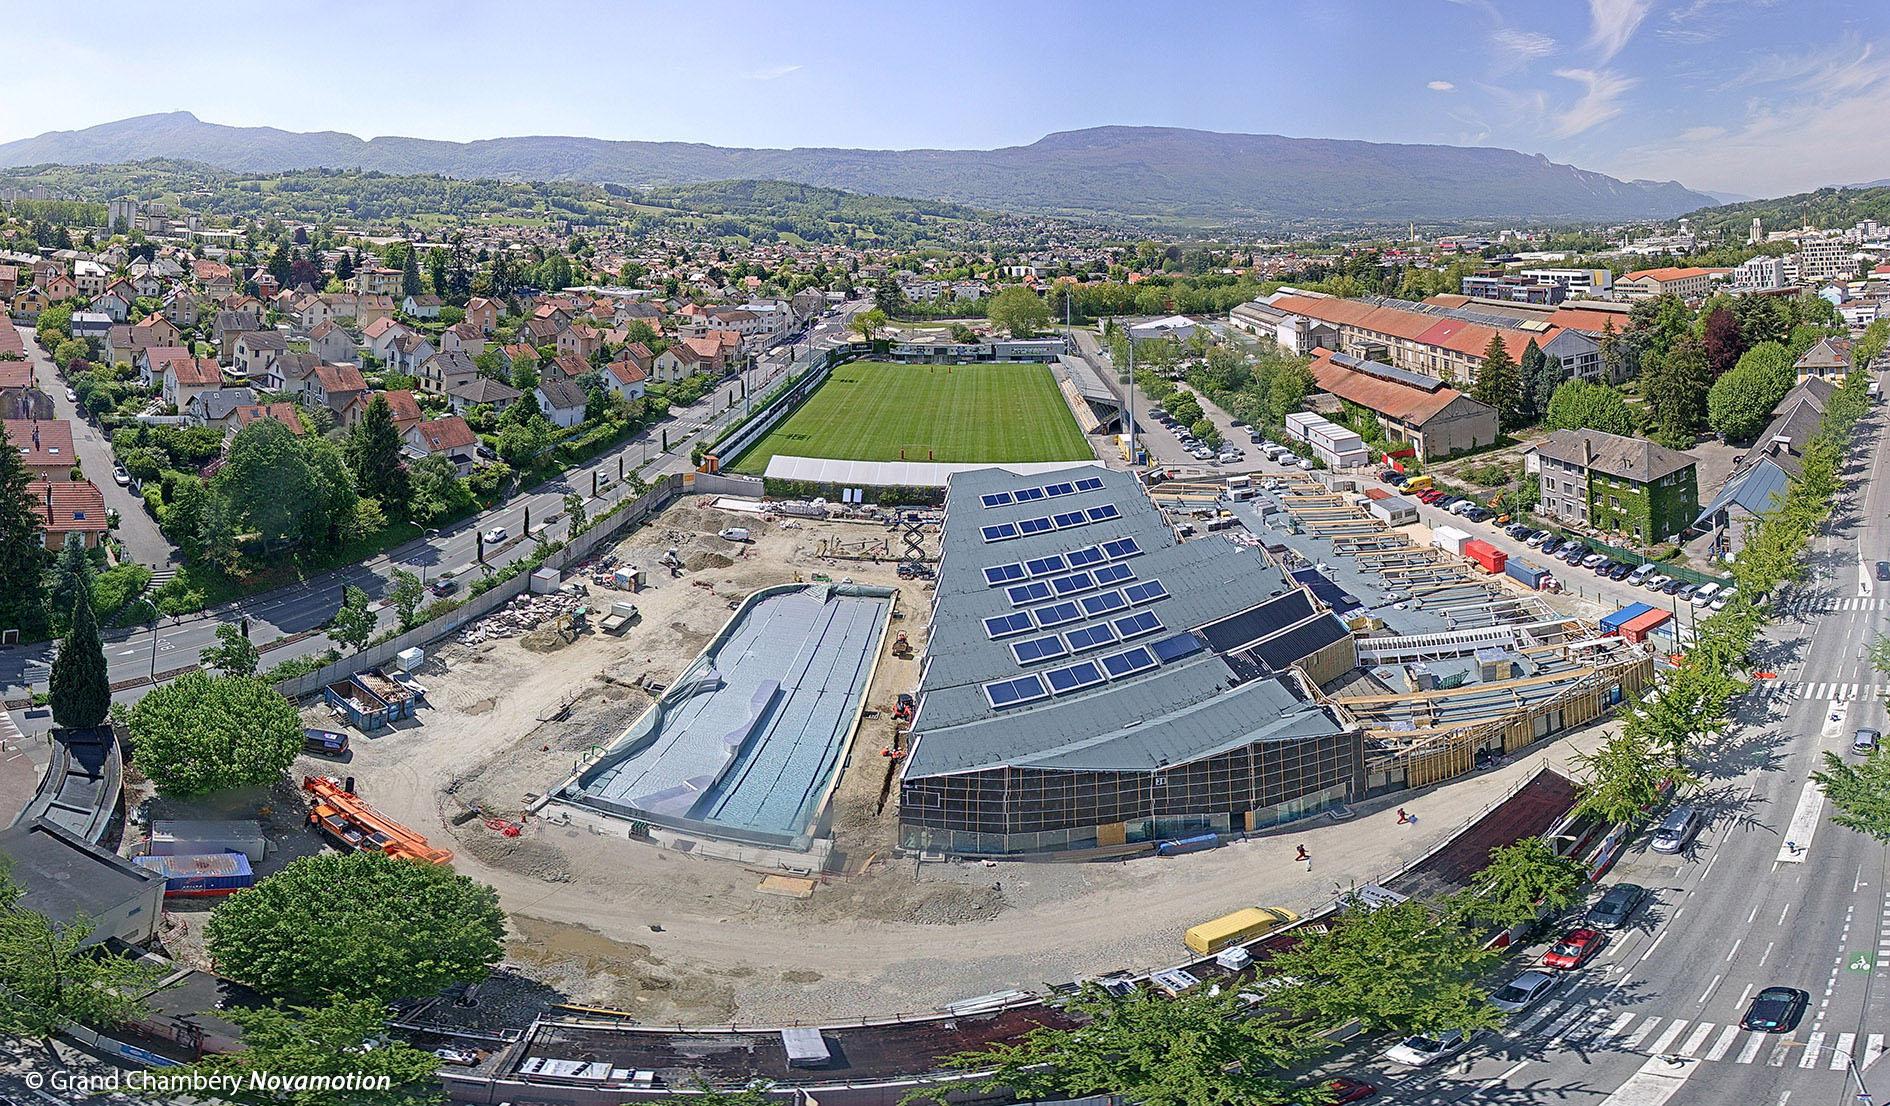 Piscine, Chambéry (73) :: Holz-Ingenieure Und Konstrukteuren intérieur Piscine Chambery